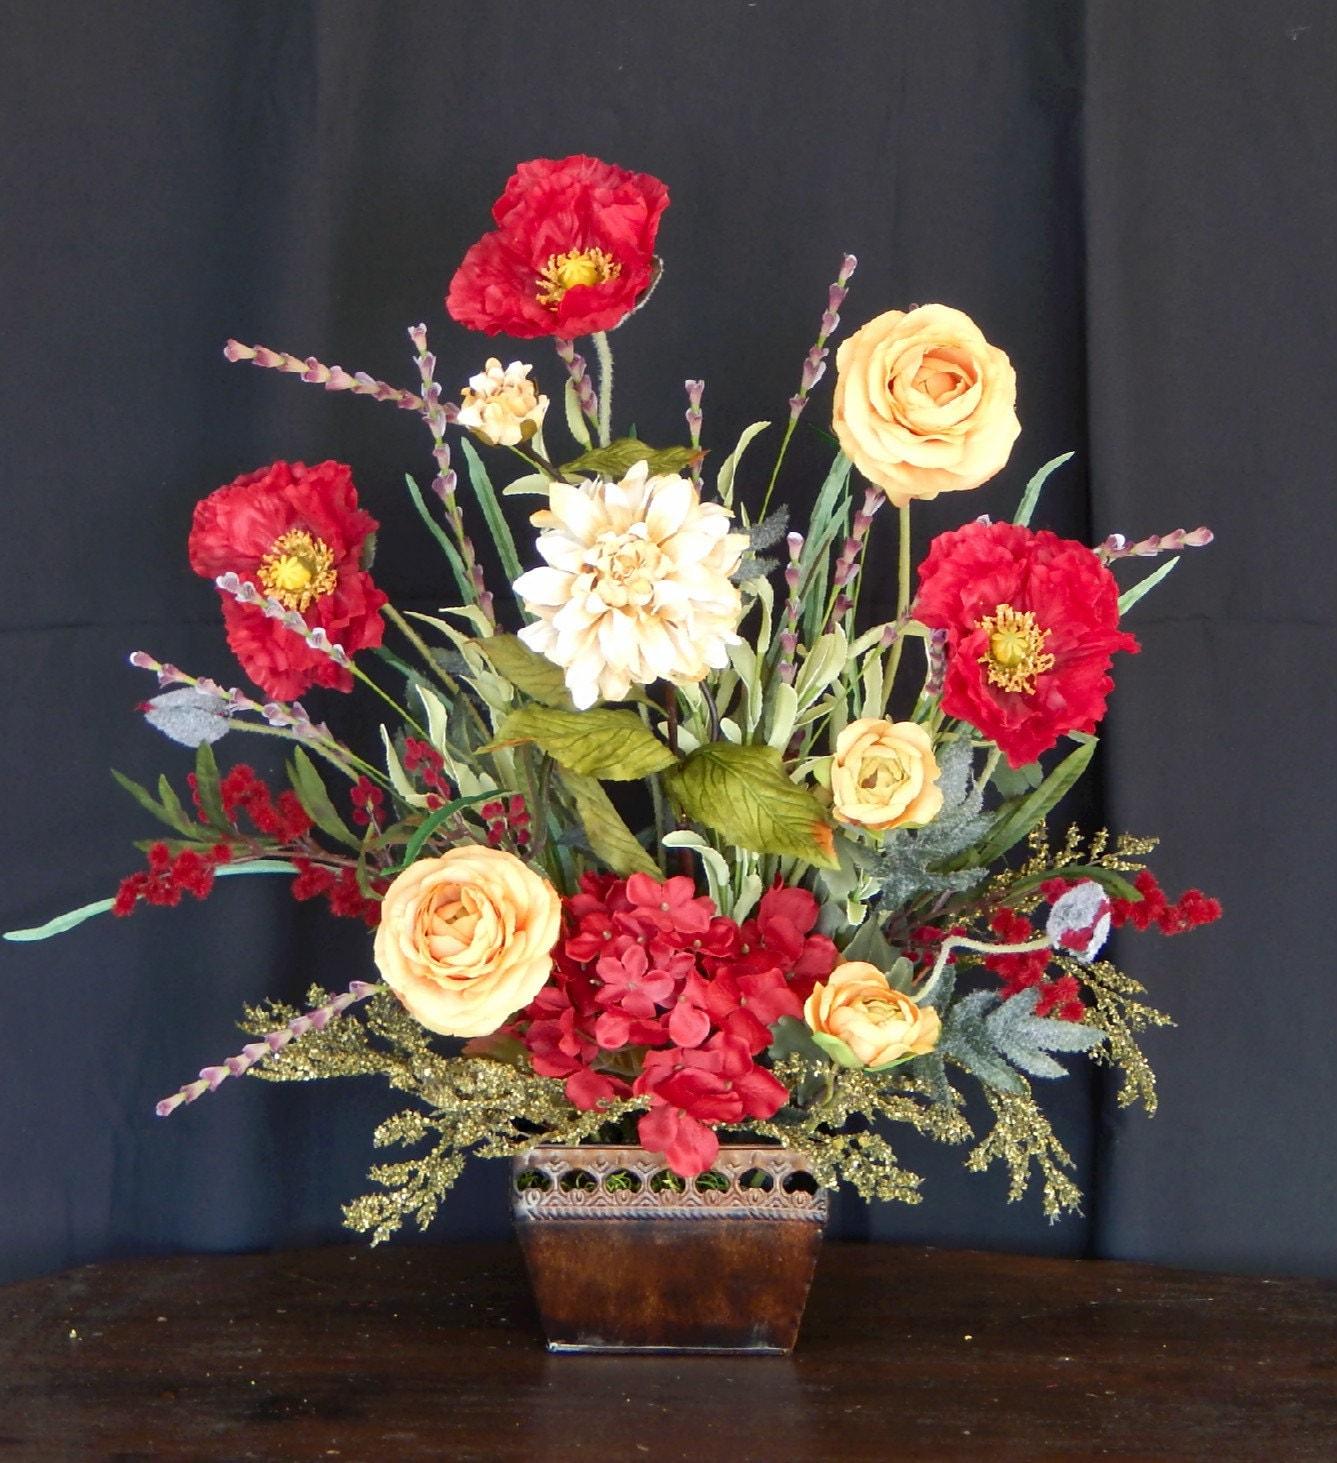 Mantel Arrangements: Red Poppy Silk Floral Arrangement Fireplace Mantel